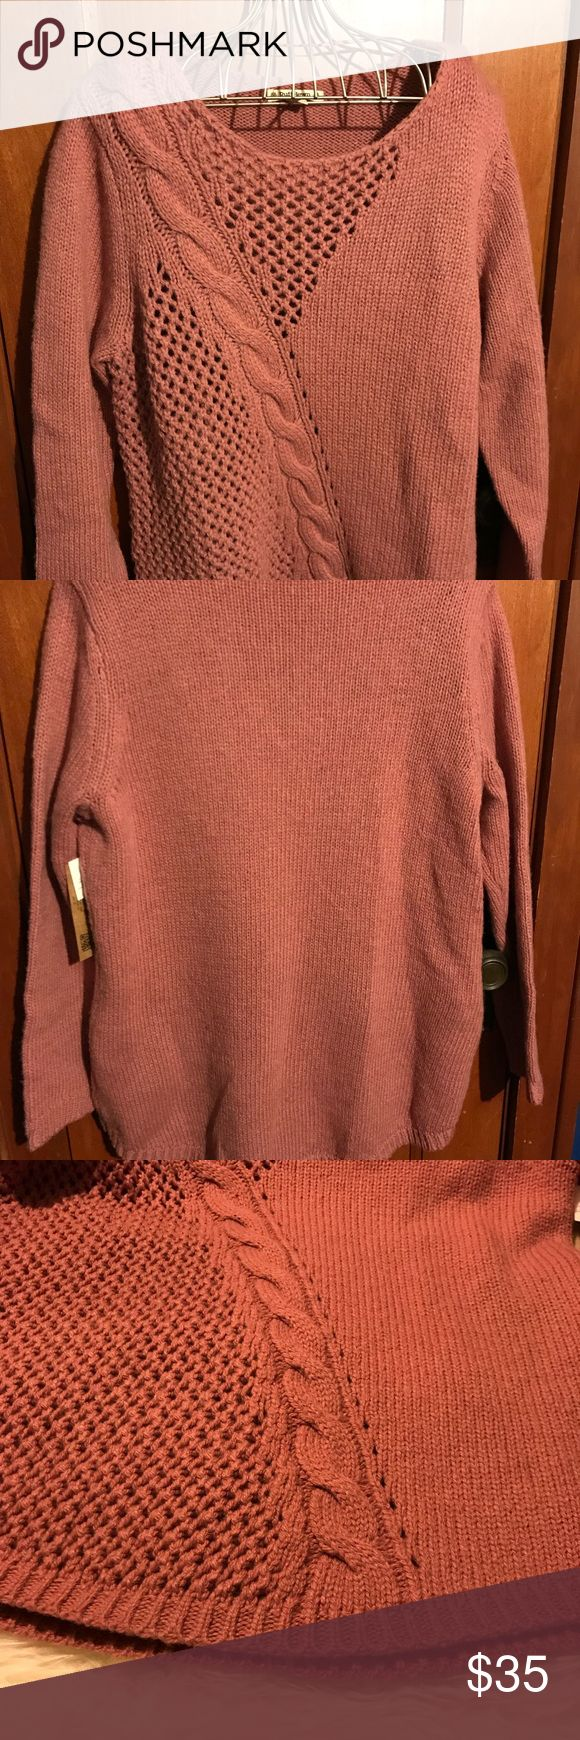 Beautiful Ruff Hewn rose gold sweater 1X Ruff Hewn sweater.  Long sleeved ribbing on ends.  Beautiful knit designs. Flattering patterns. Ruff Hewn Sweaters